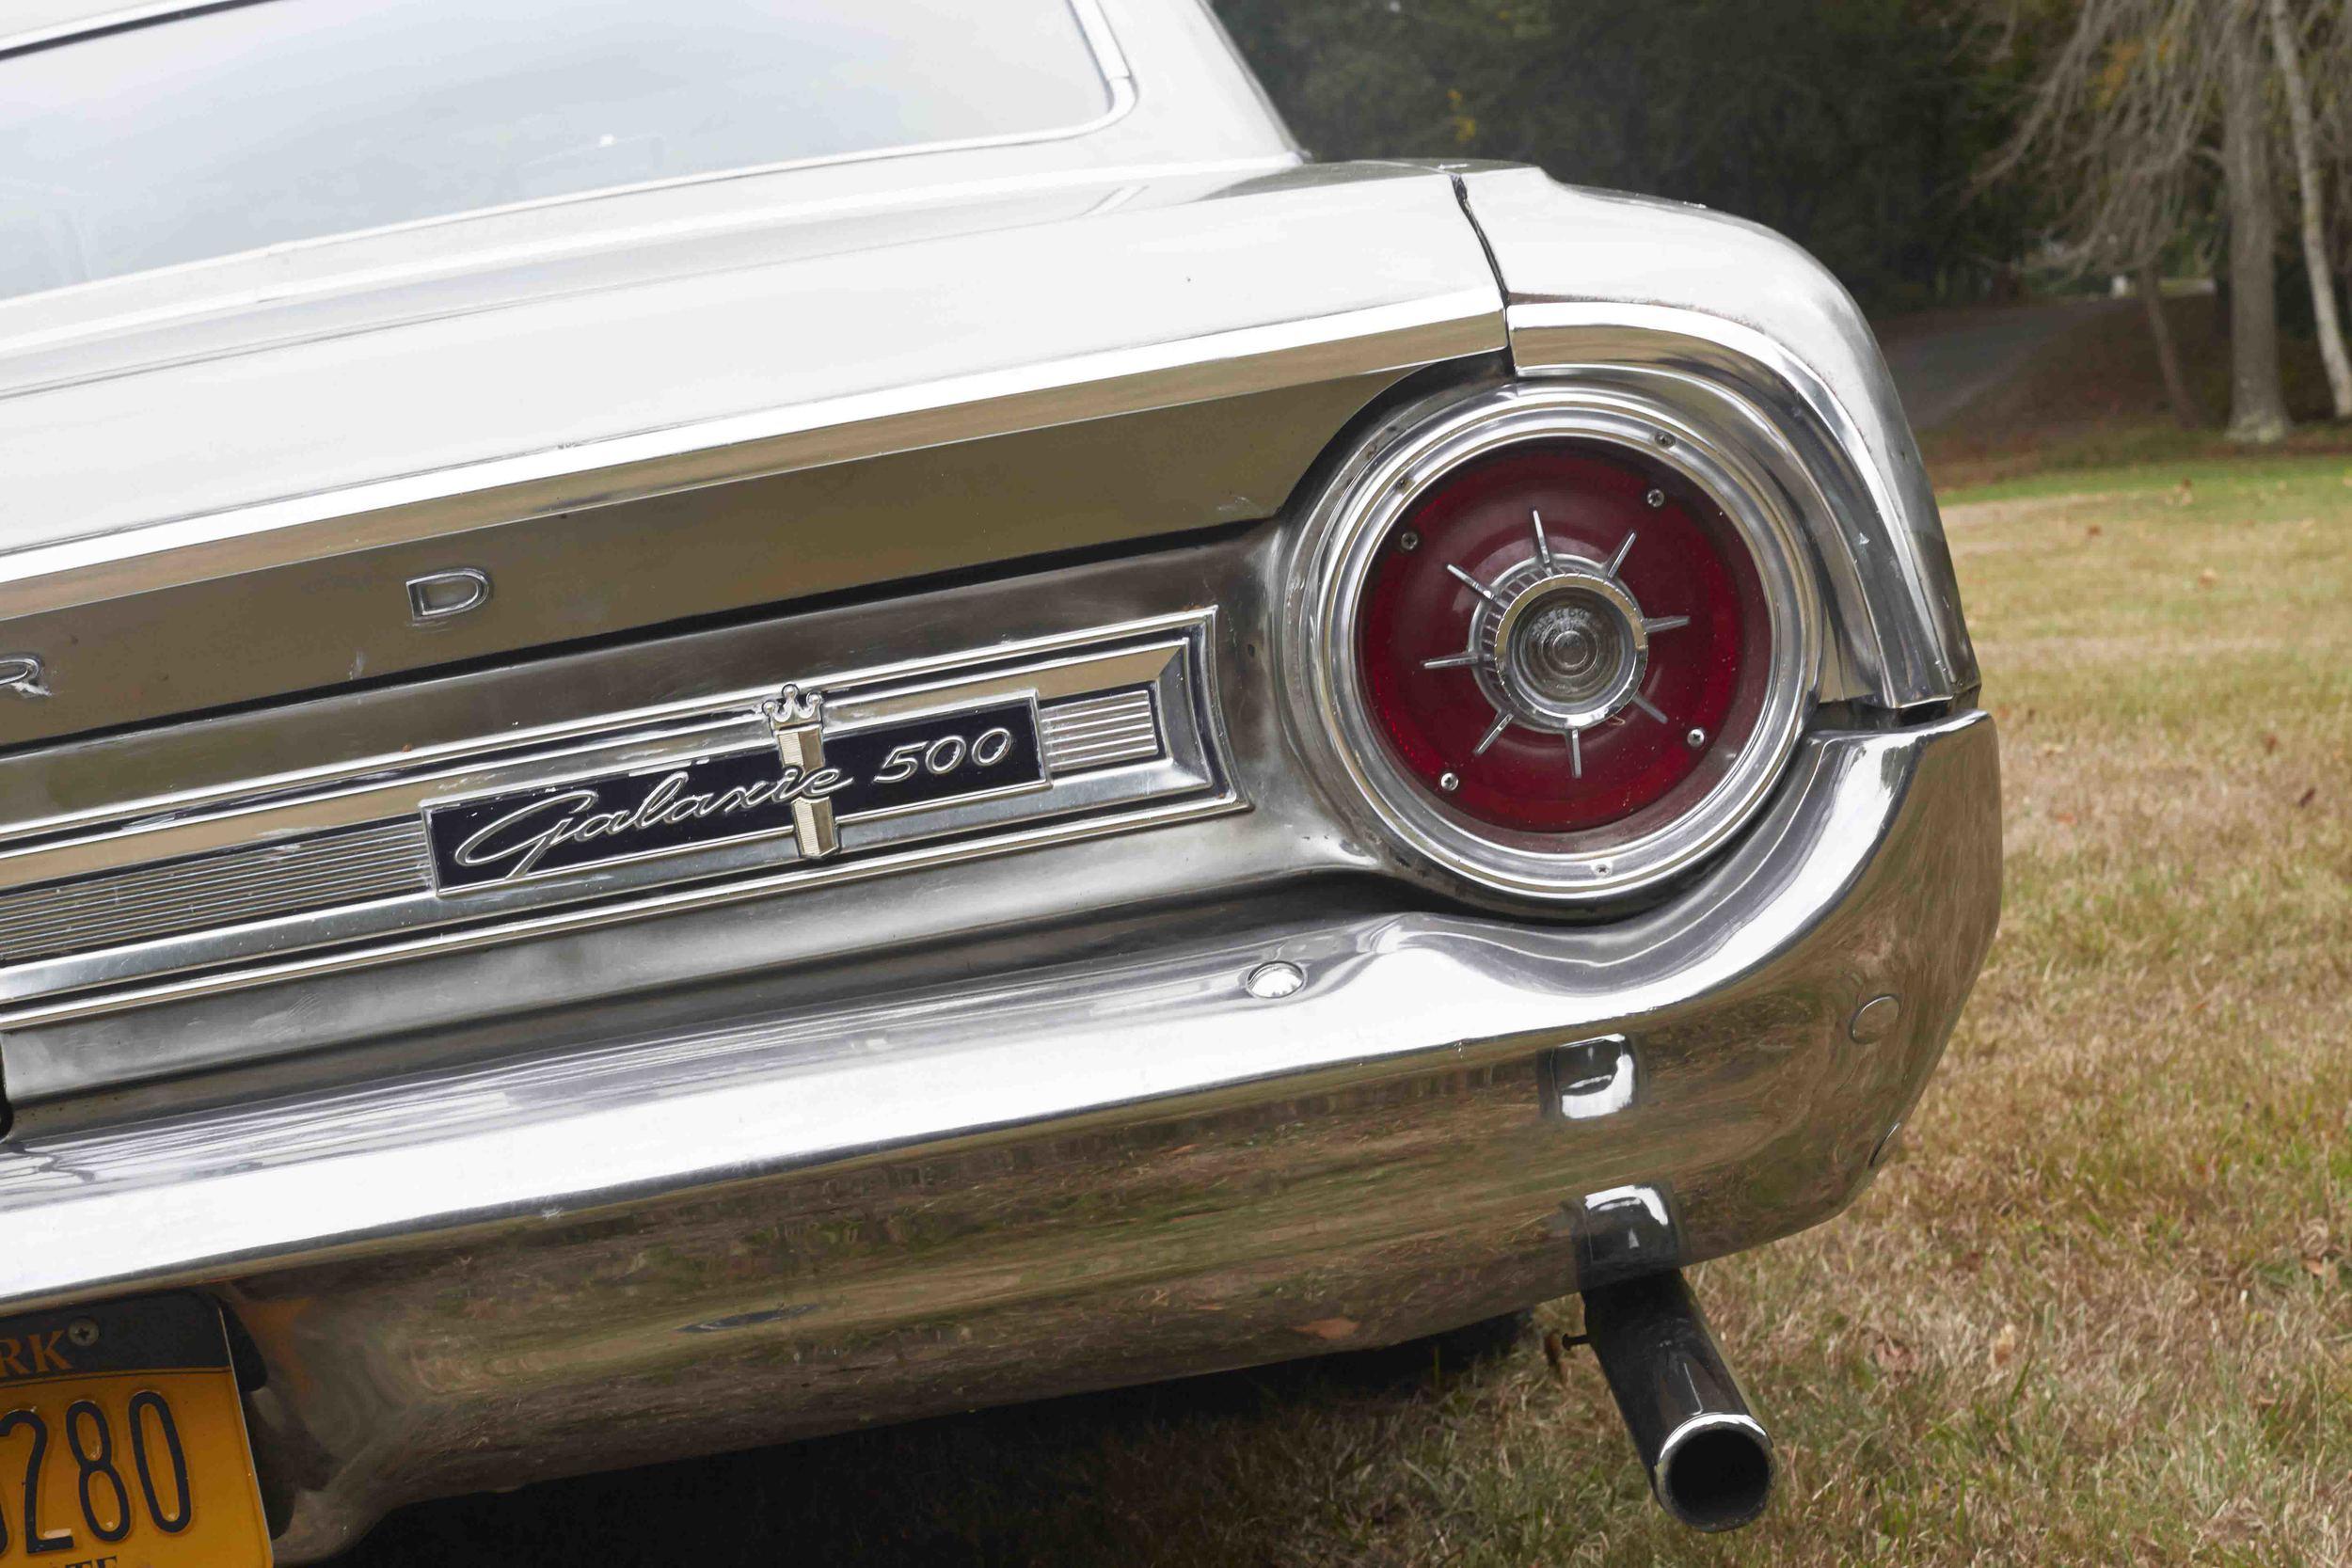 FordGalaxieRearAngle.jpg